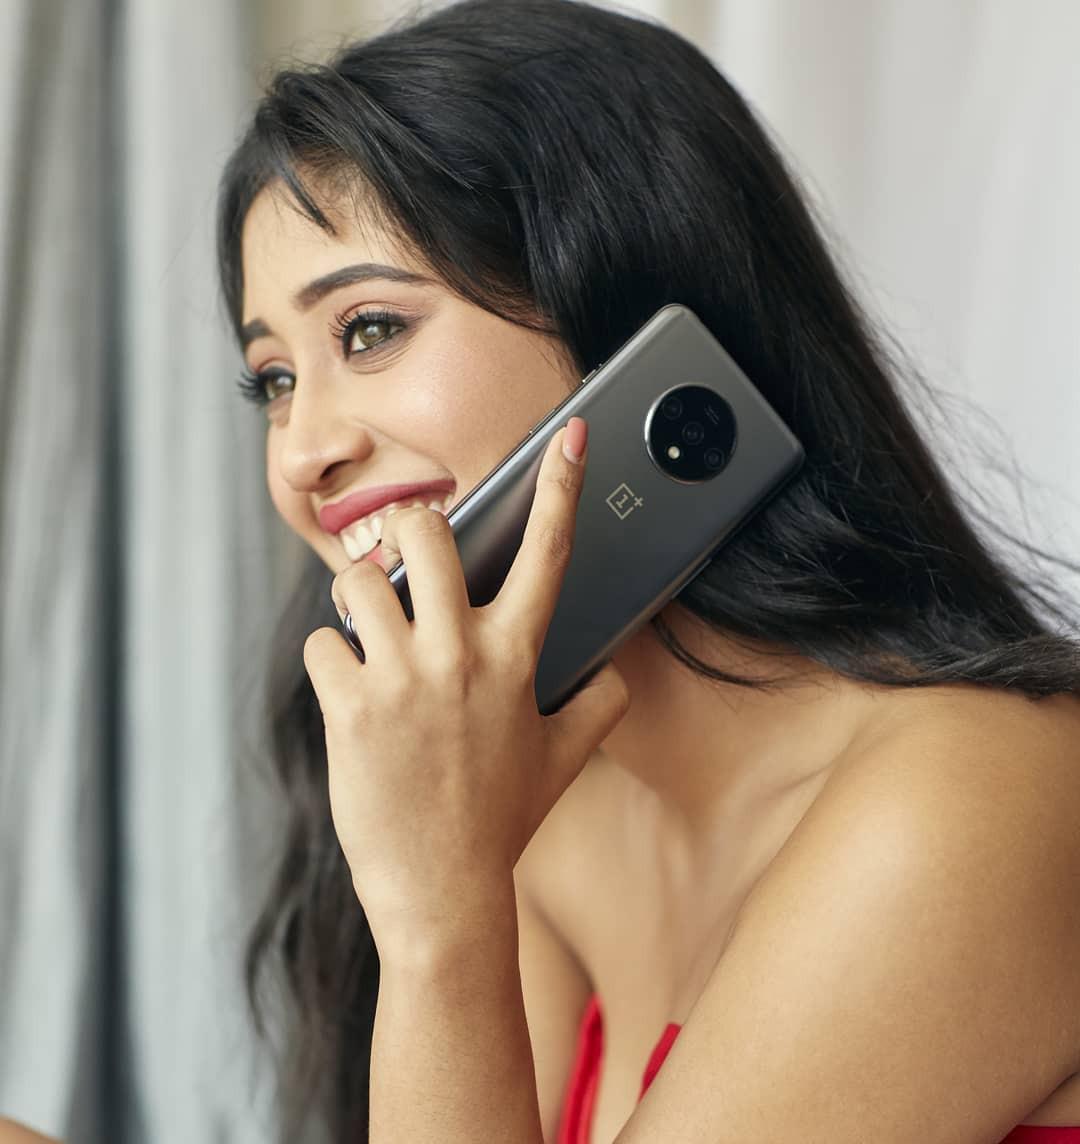 Shivangi Joshi Natural Black Hairstyles, Beautiful Girl Cute Face, Lip Makeup